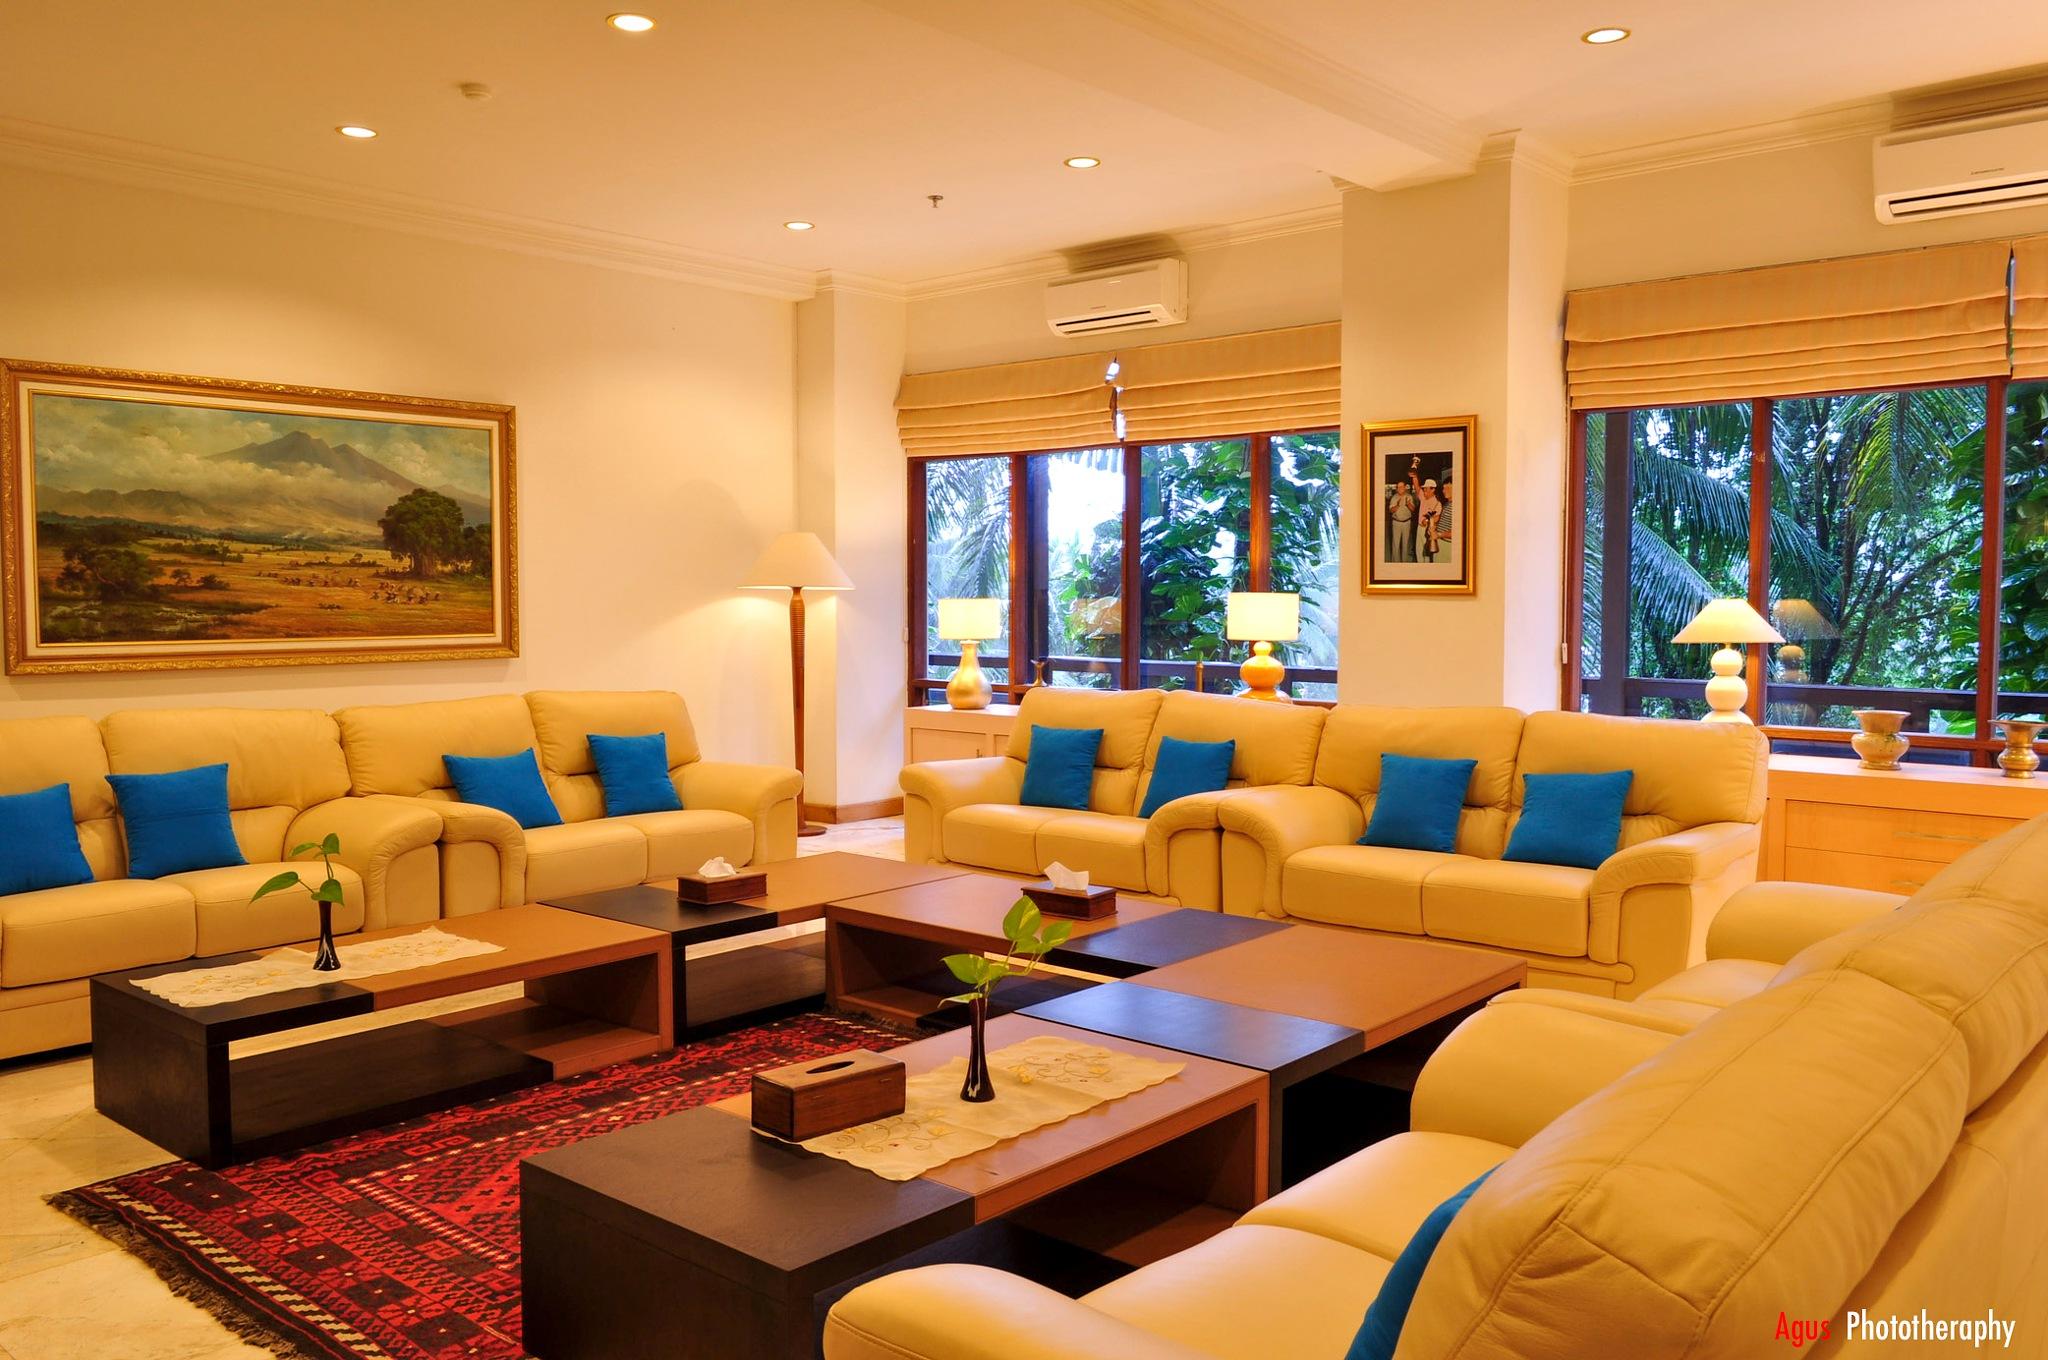 Hotel Room by http://agusherisetiawan.blogspot.co.id/